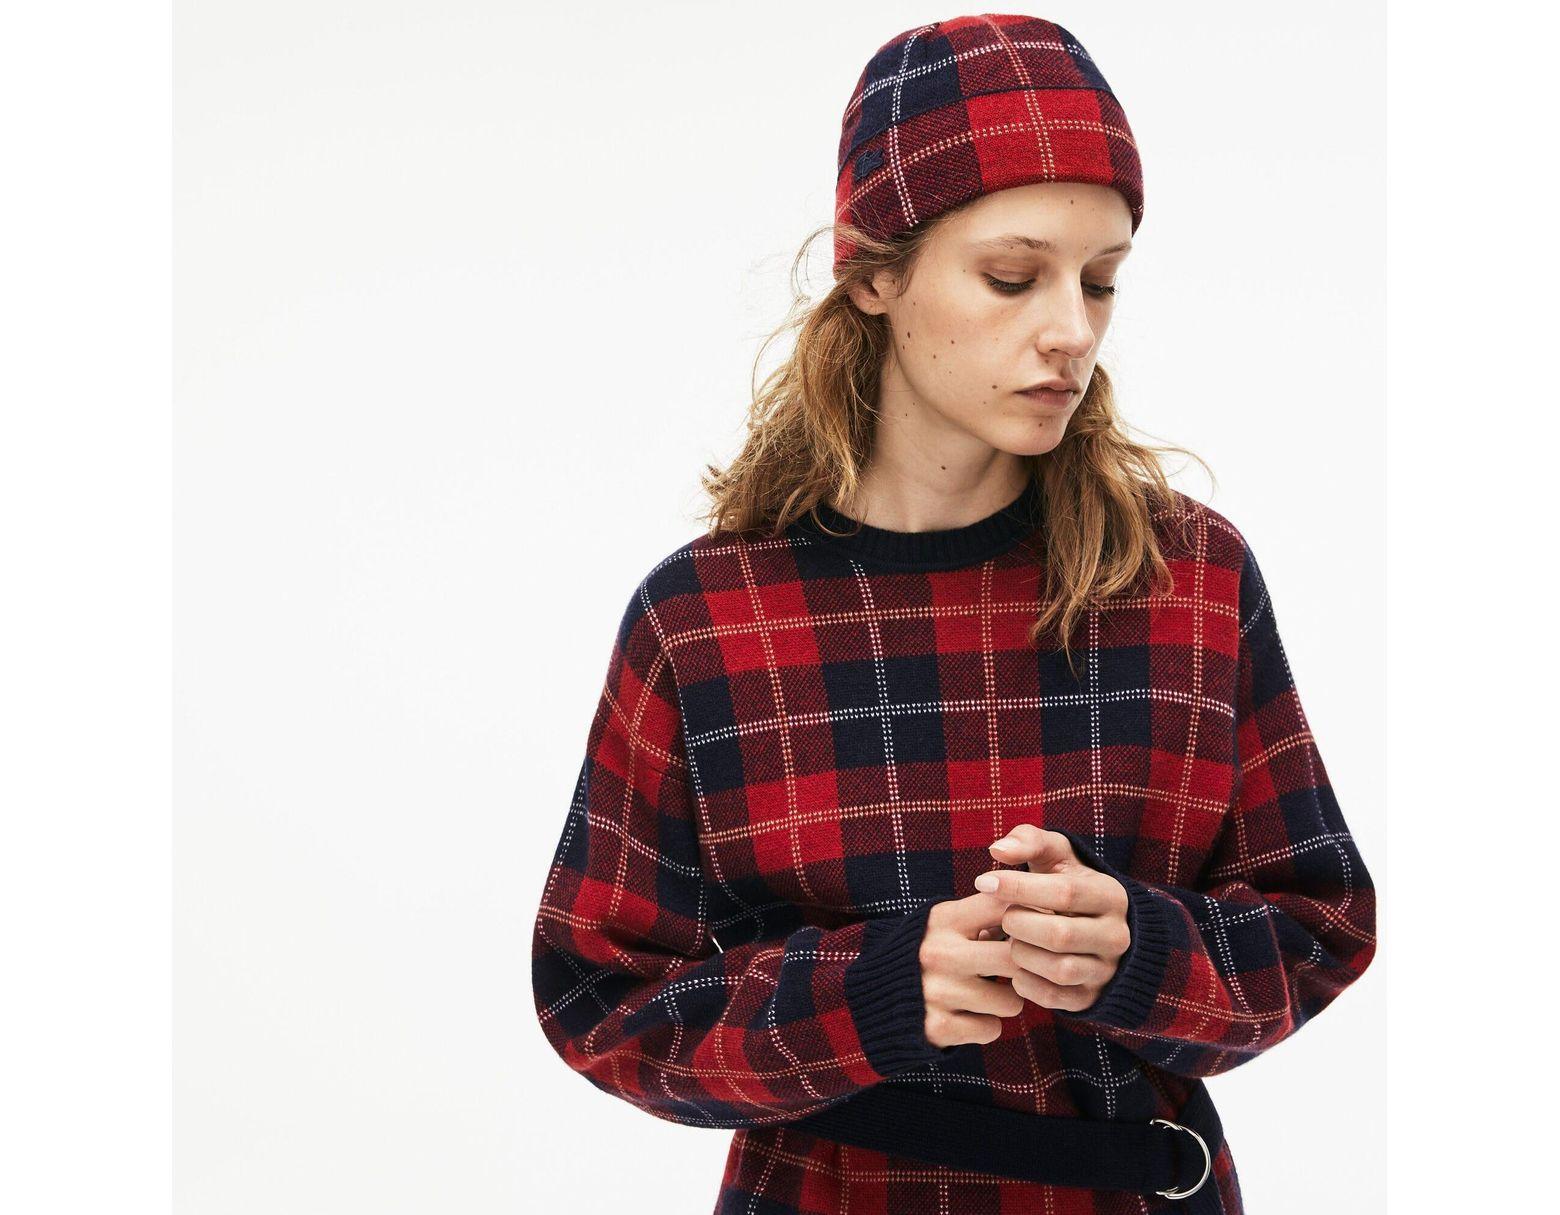 341d40428f Women's Red Stand-up Neck Tartan Check Print Wool Jacquard Sweater